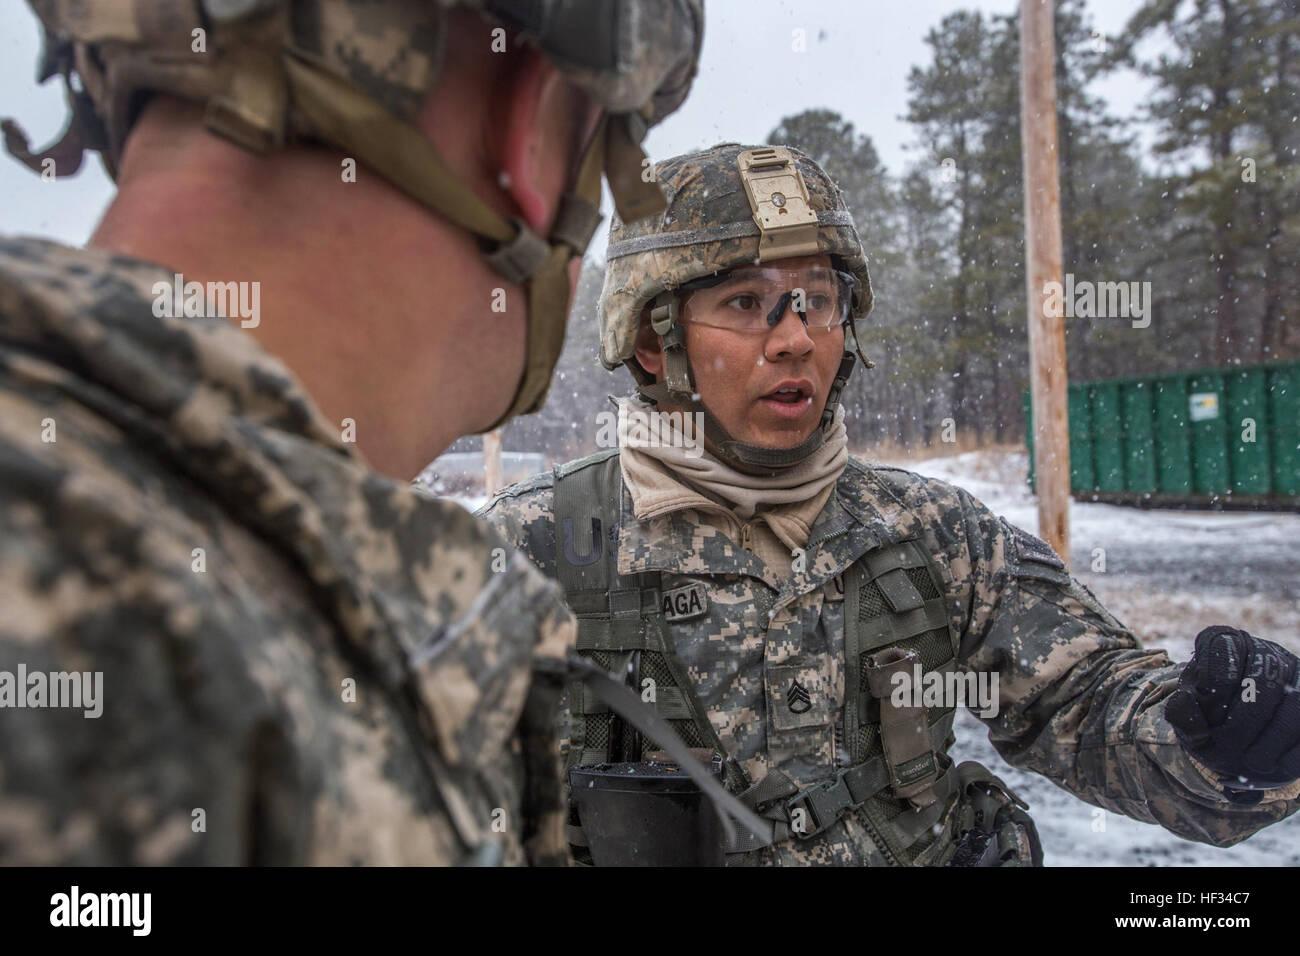 Staff Sgt. Manuel Larranaga Jr., right, evaluates Spcs. Brendan P. Boyle and Tyler J. Menz's performance at the Stock Photo